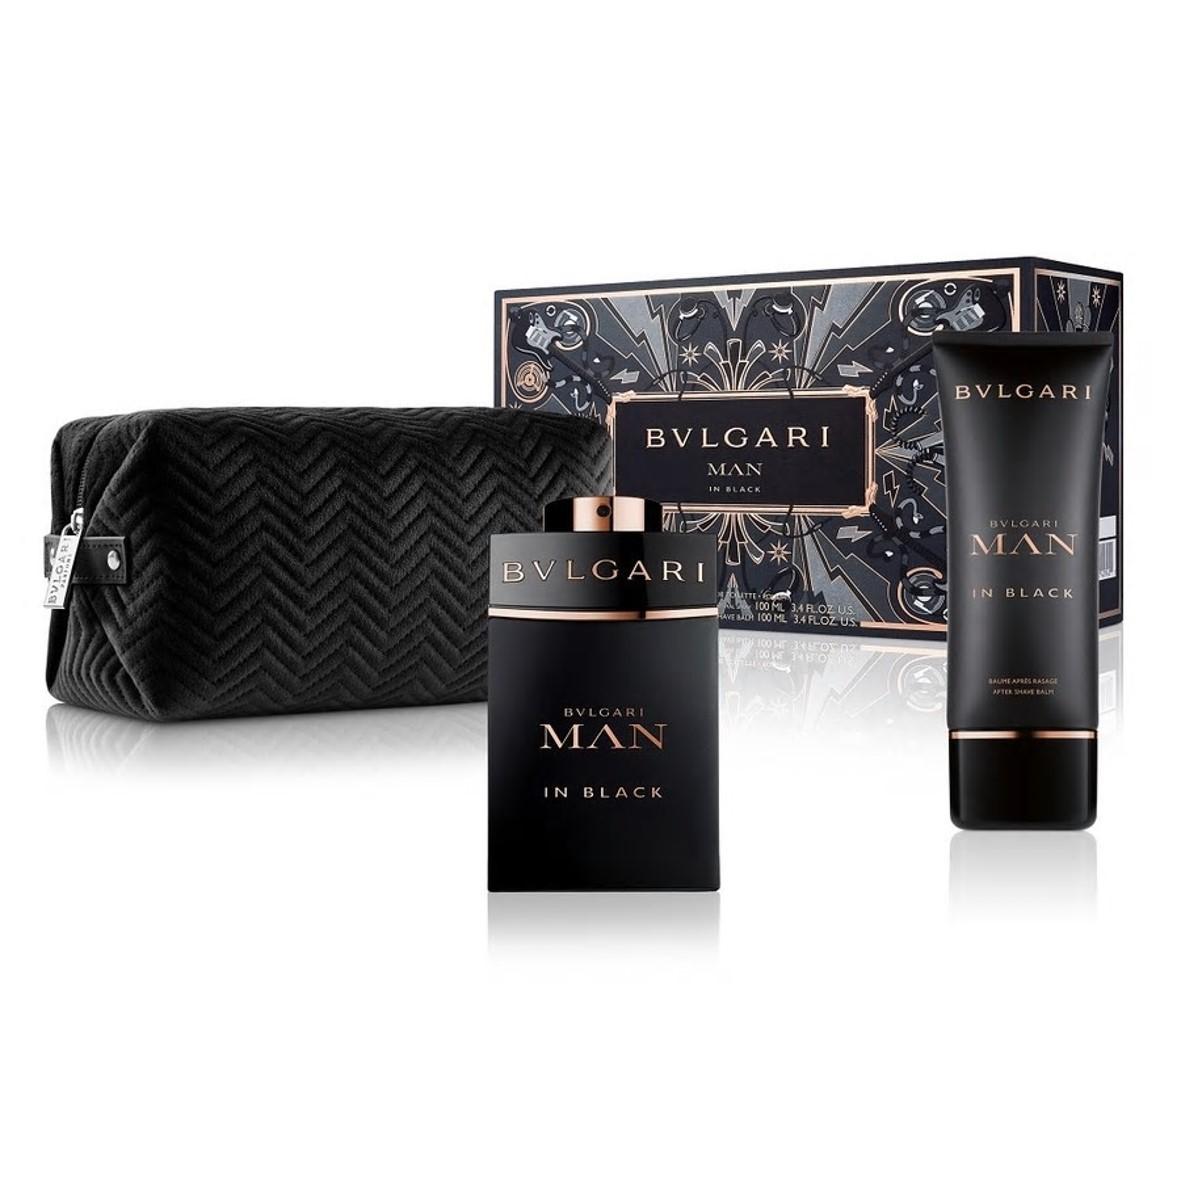 Bvlgari - Man In Black Eau de Parfum 100Ml Set -